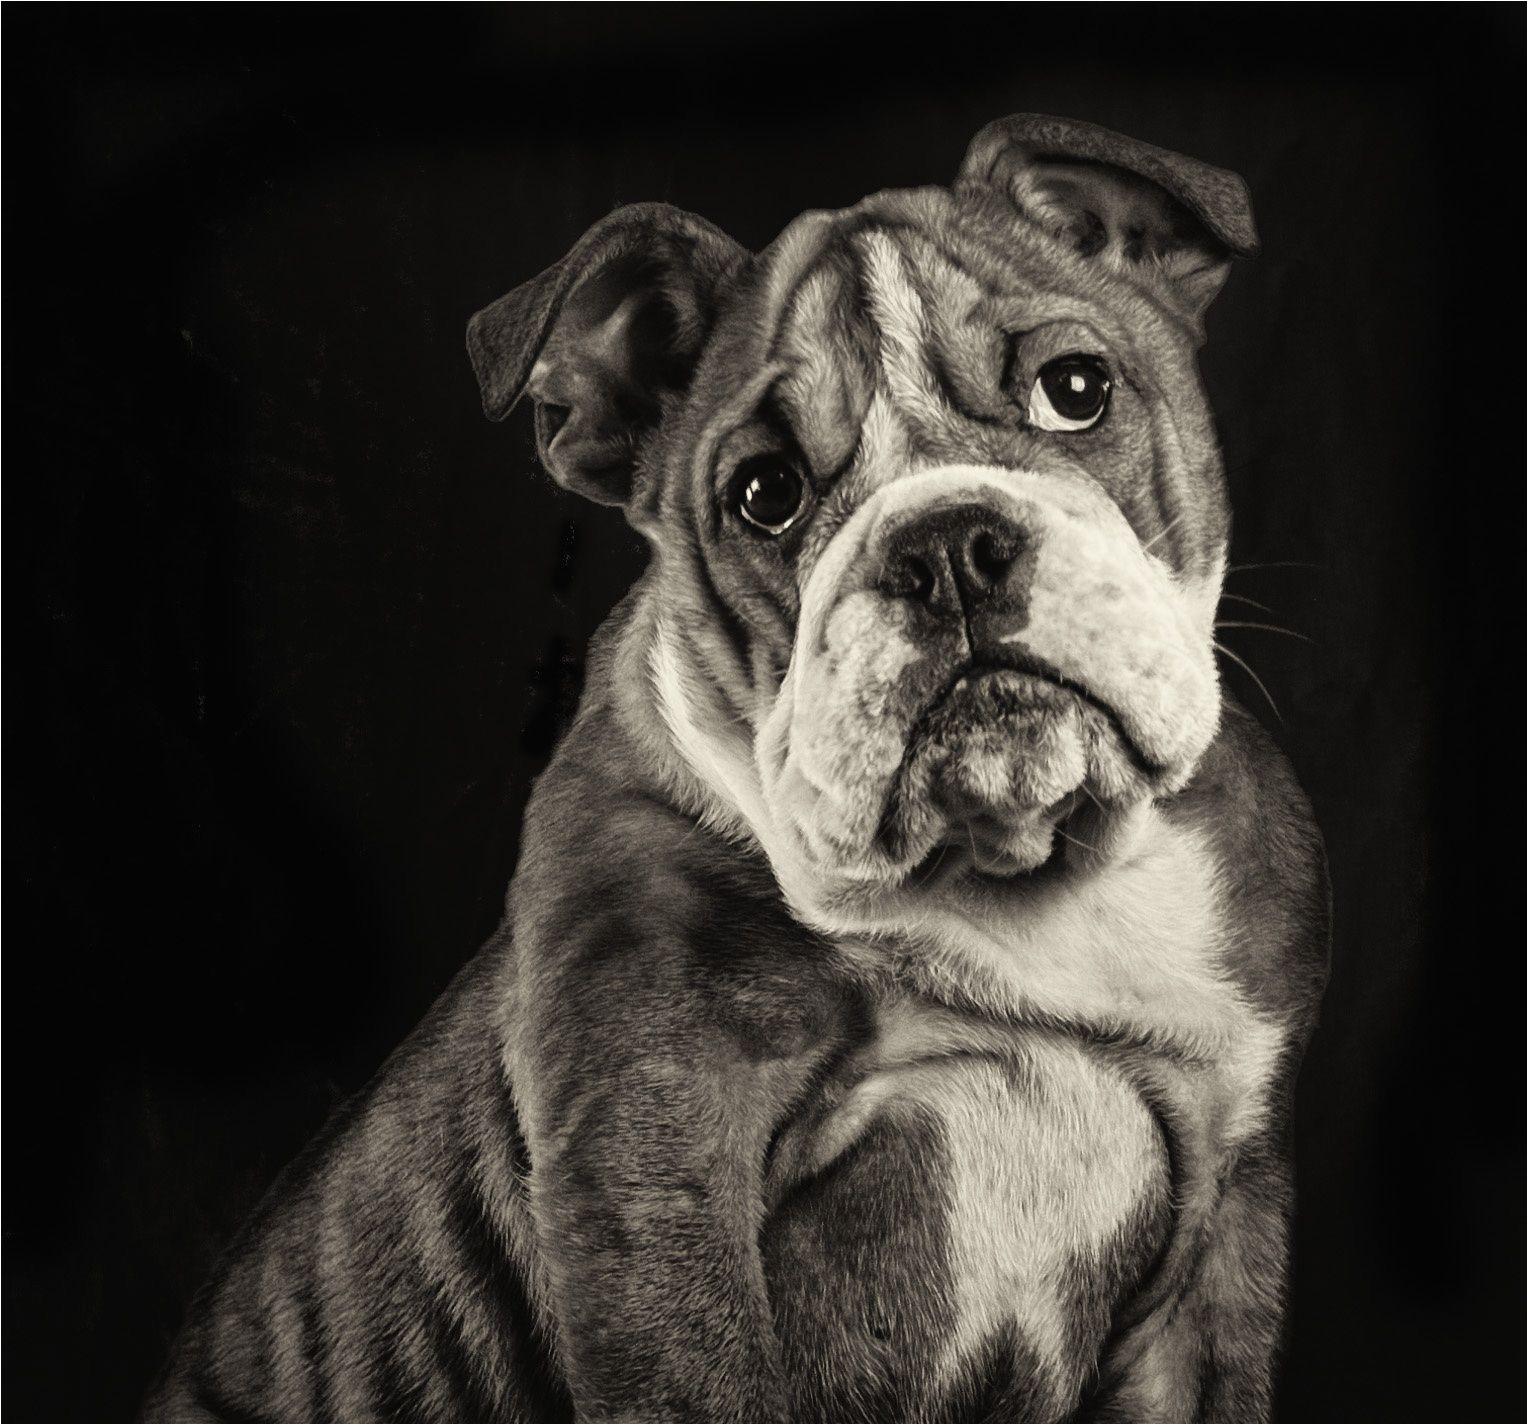 boris english bulldog puppy awwww photograph by marco koopman dog dogphoto blackandwhite